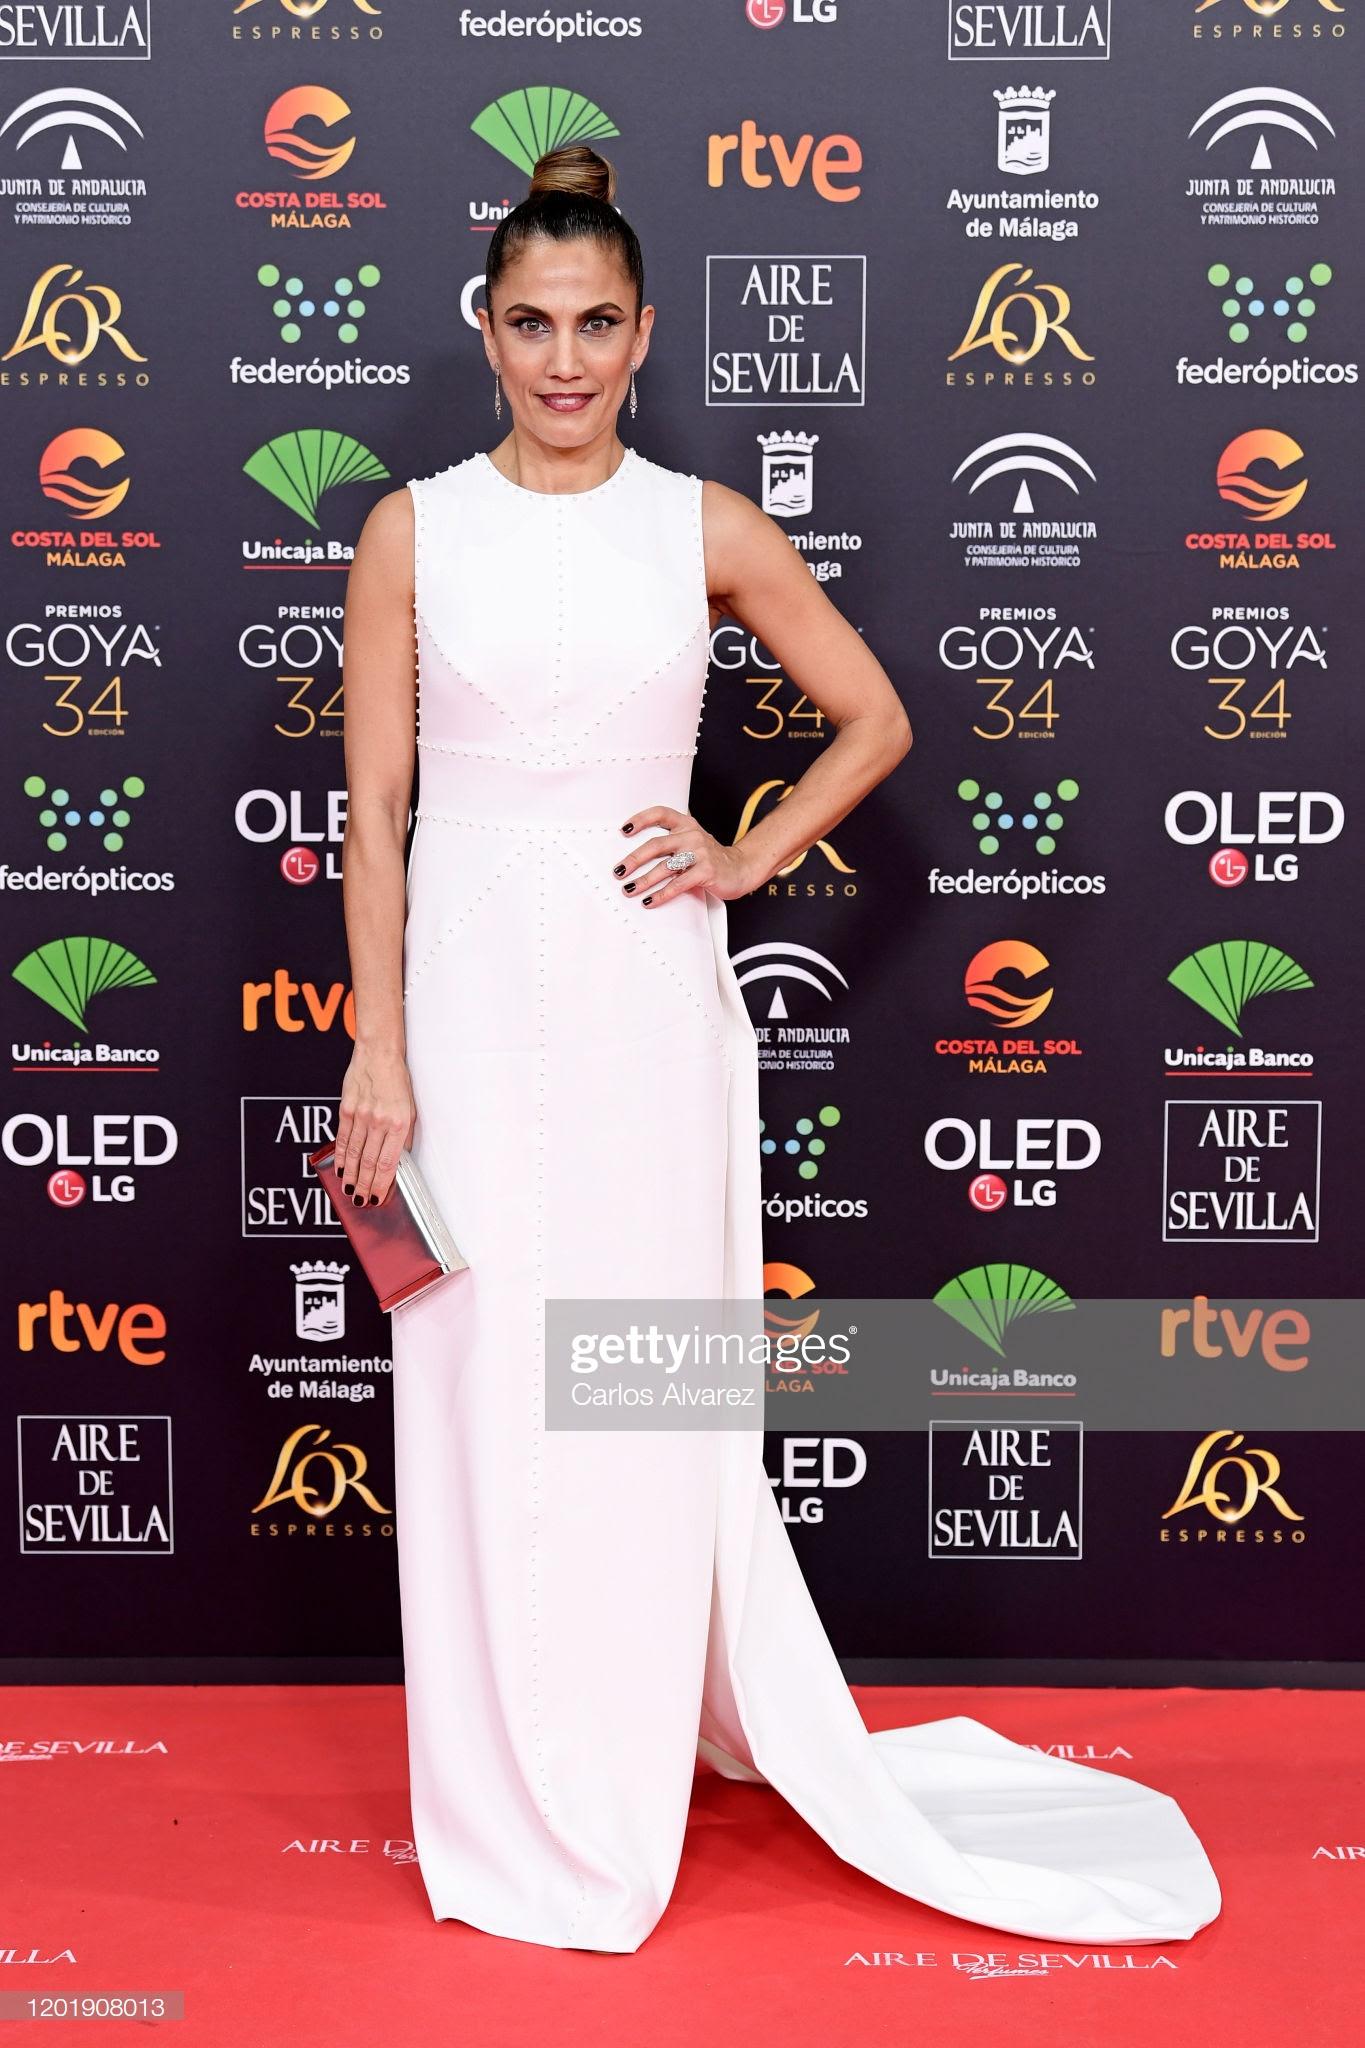 04028d7b 4a08 46fa abea 7dfa5853cc8a - Premios Goya 2020 : Looks de todas las celebrities que lucieron  marcas de Replica